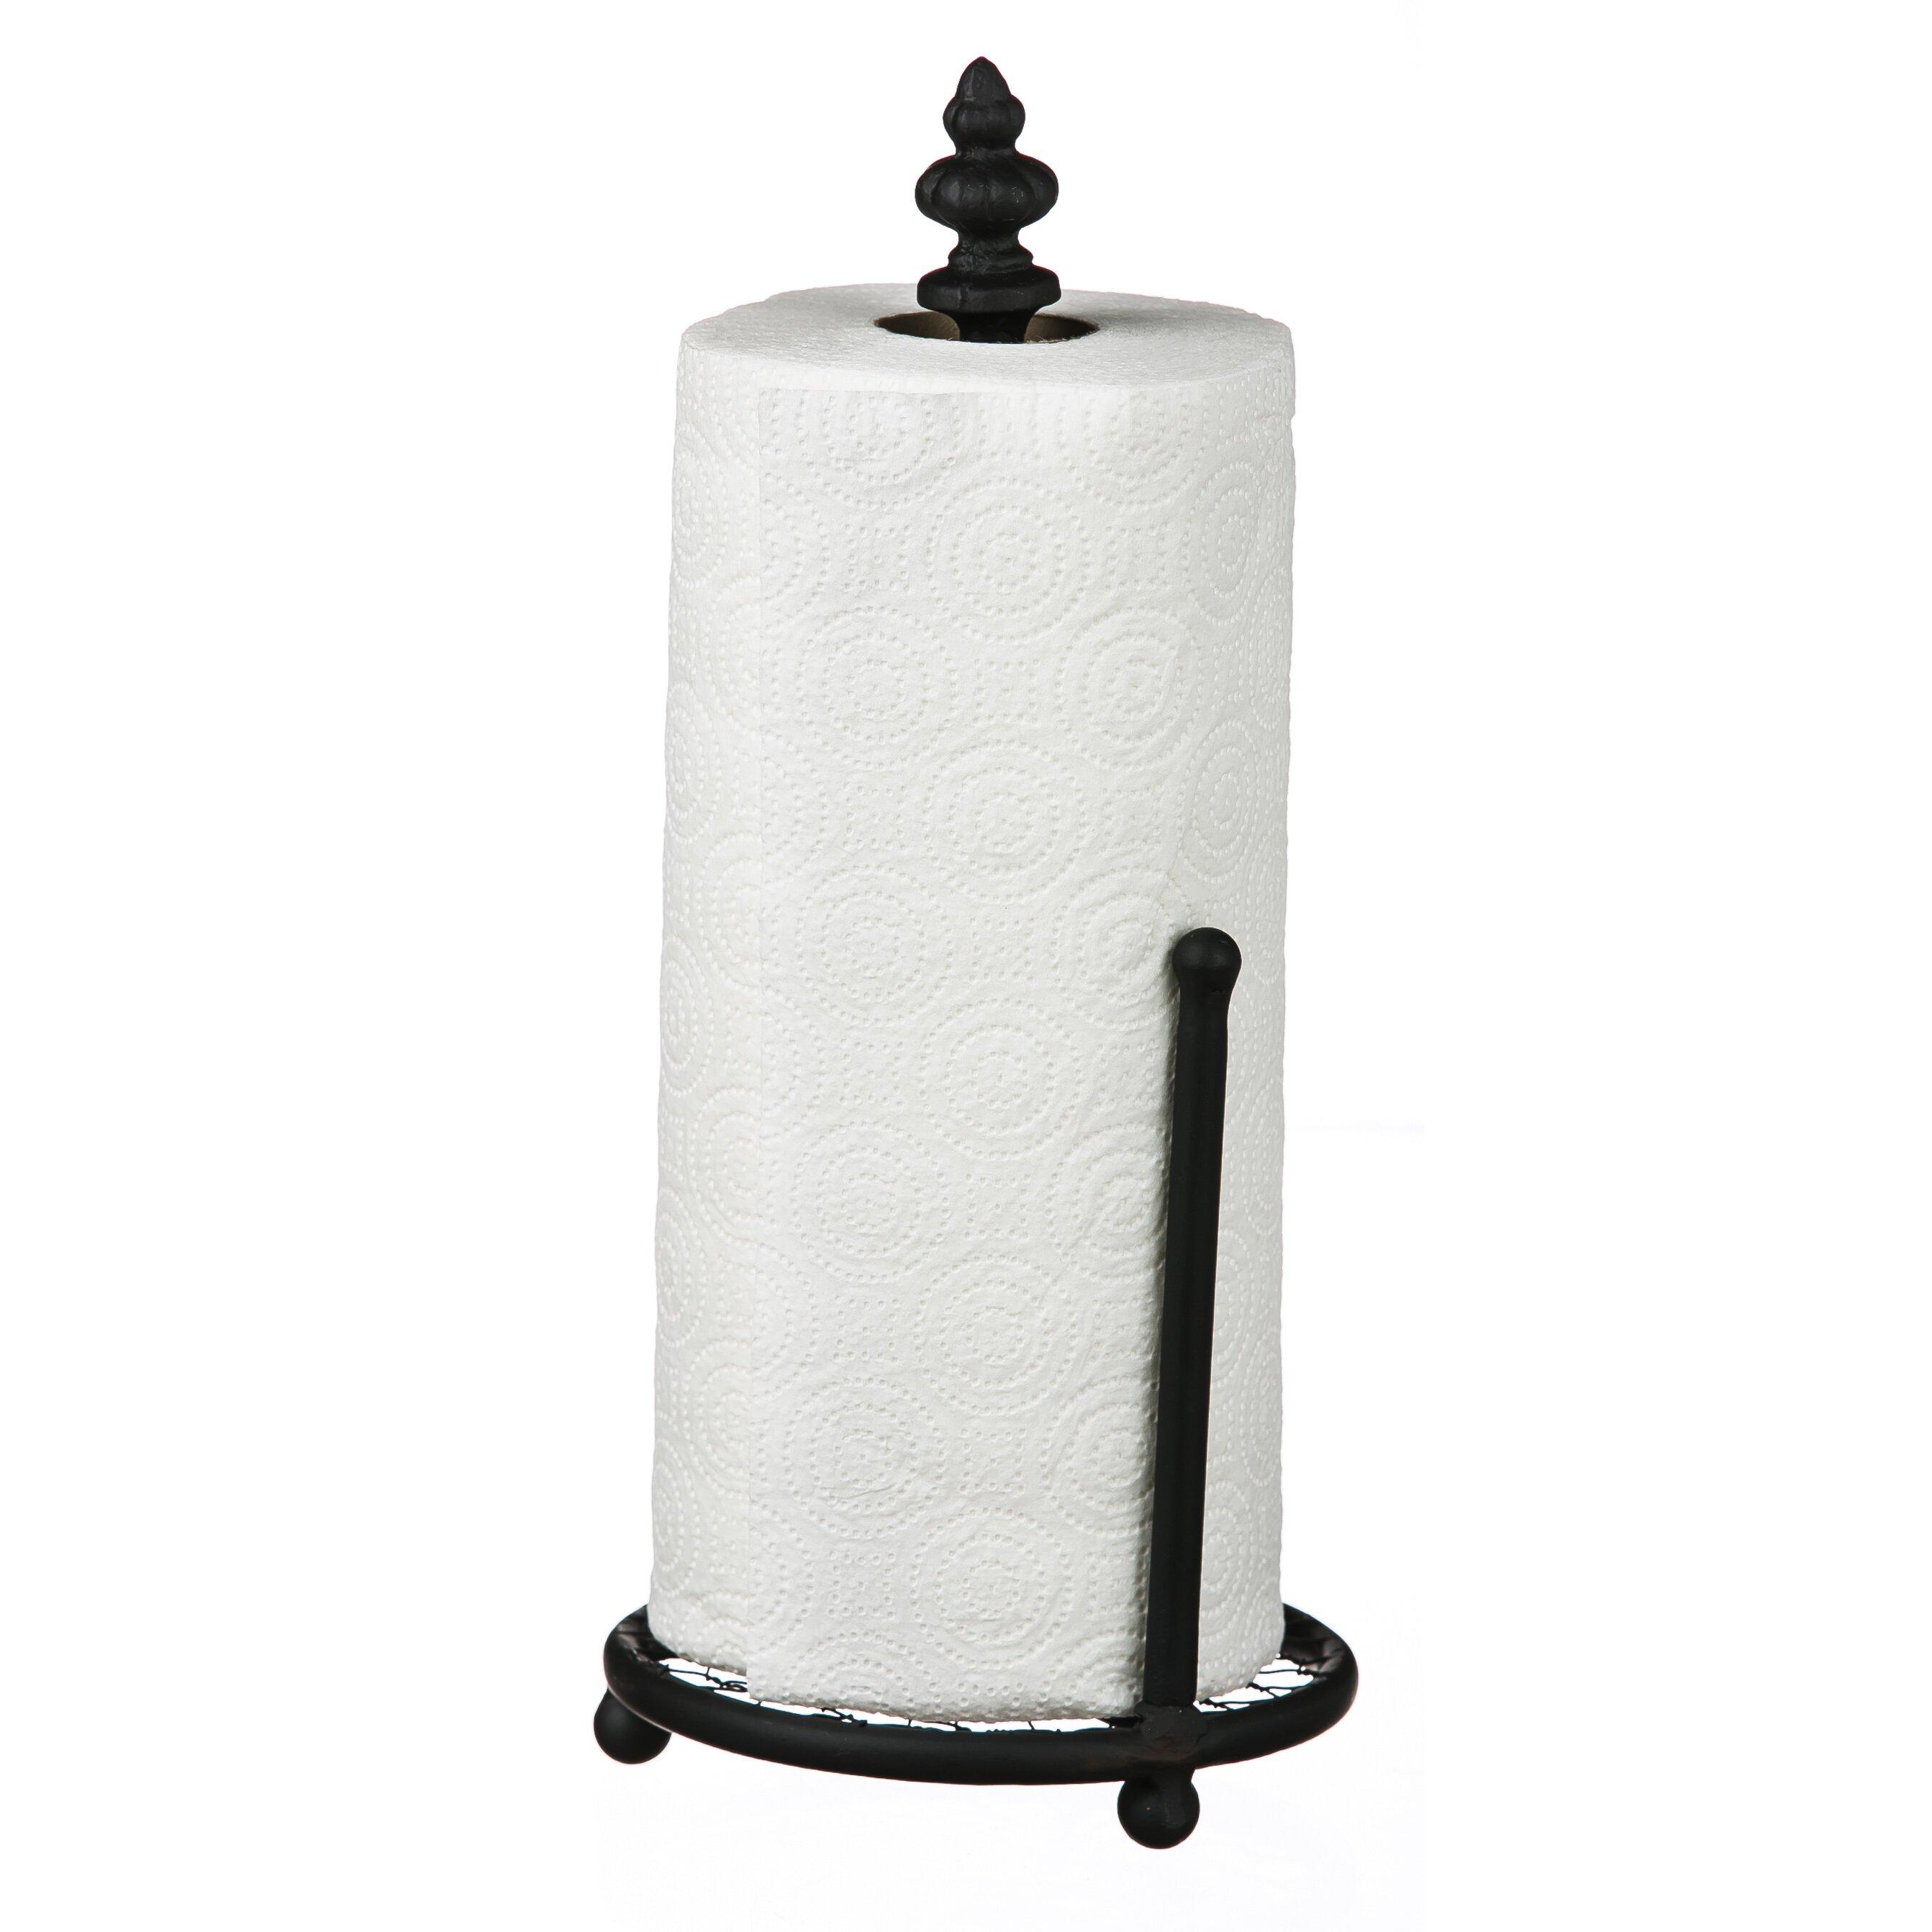 August Grove Metal Paper Towel Holder & Reviews  Wayfair. Jeffrey Alexander Hardware. Stone Shop. Home Goods Table Lamps. Hardwood Stairs. Pioneer Linens. Cabinet Pull Handles. Built In Range. Cream Leather Sofa